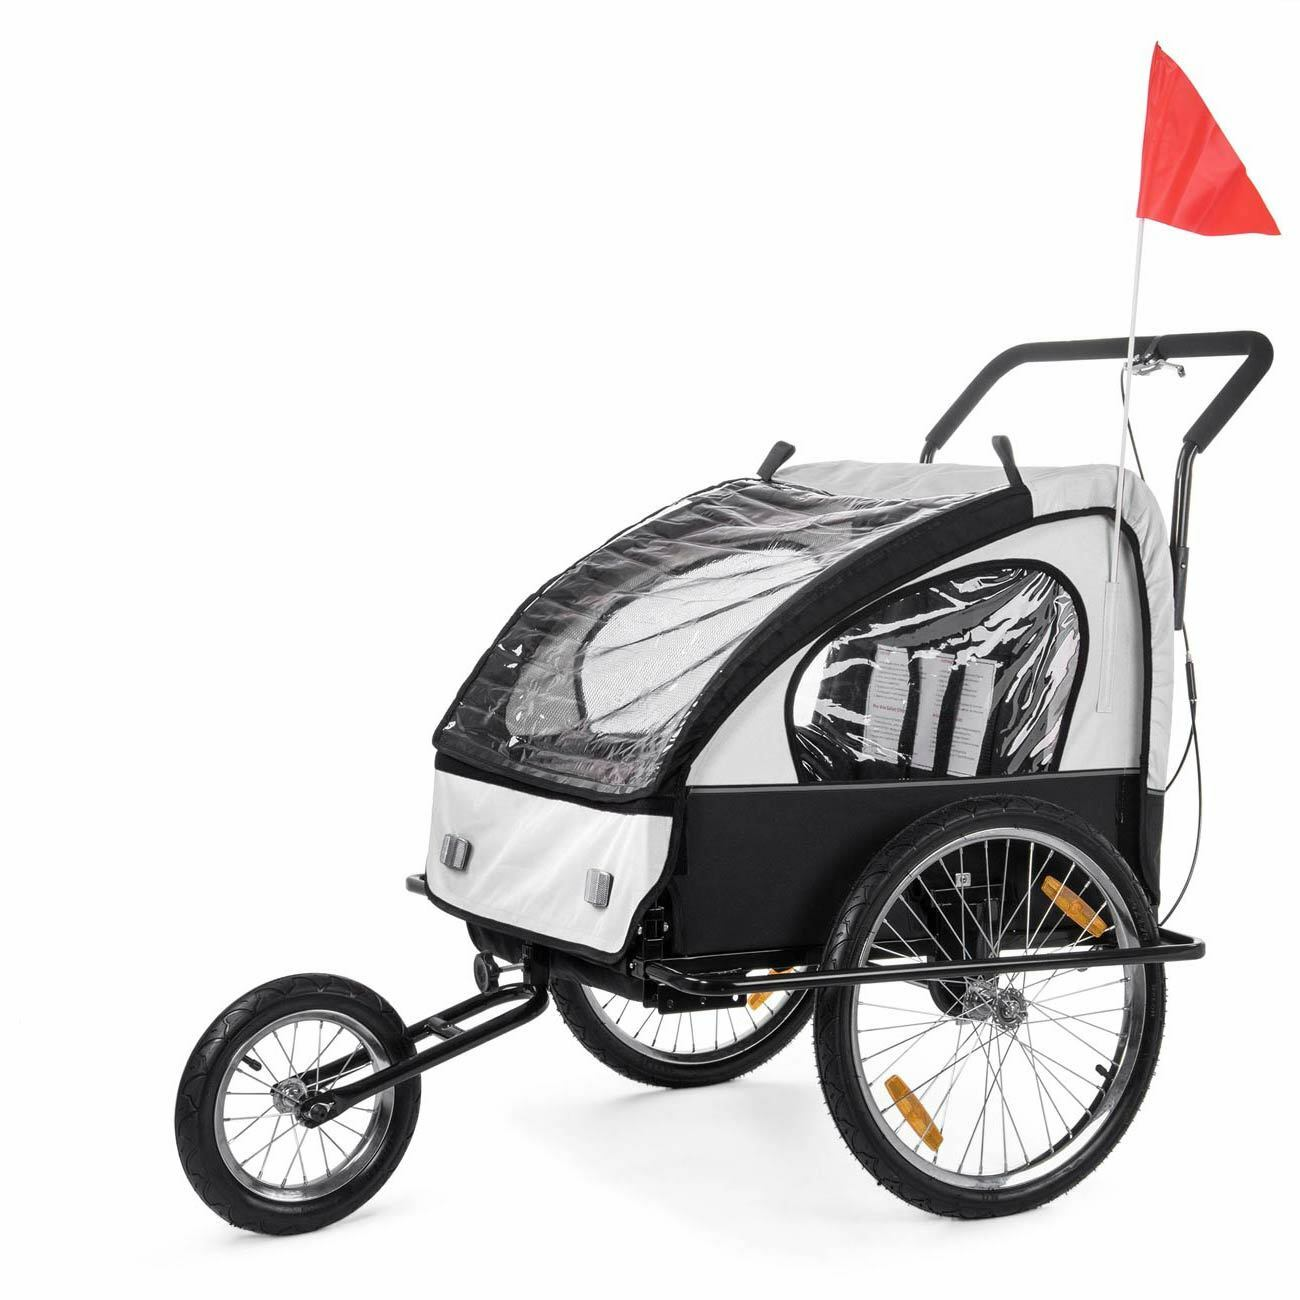 Remorque Vélo Transport Convertible Jogger 2en1 Enfants Amortisseur Transport Vélo Neuf SAMAX 93dbc5